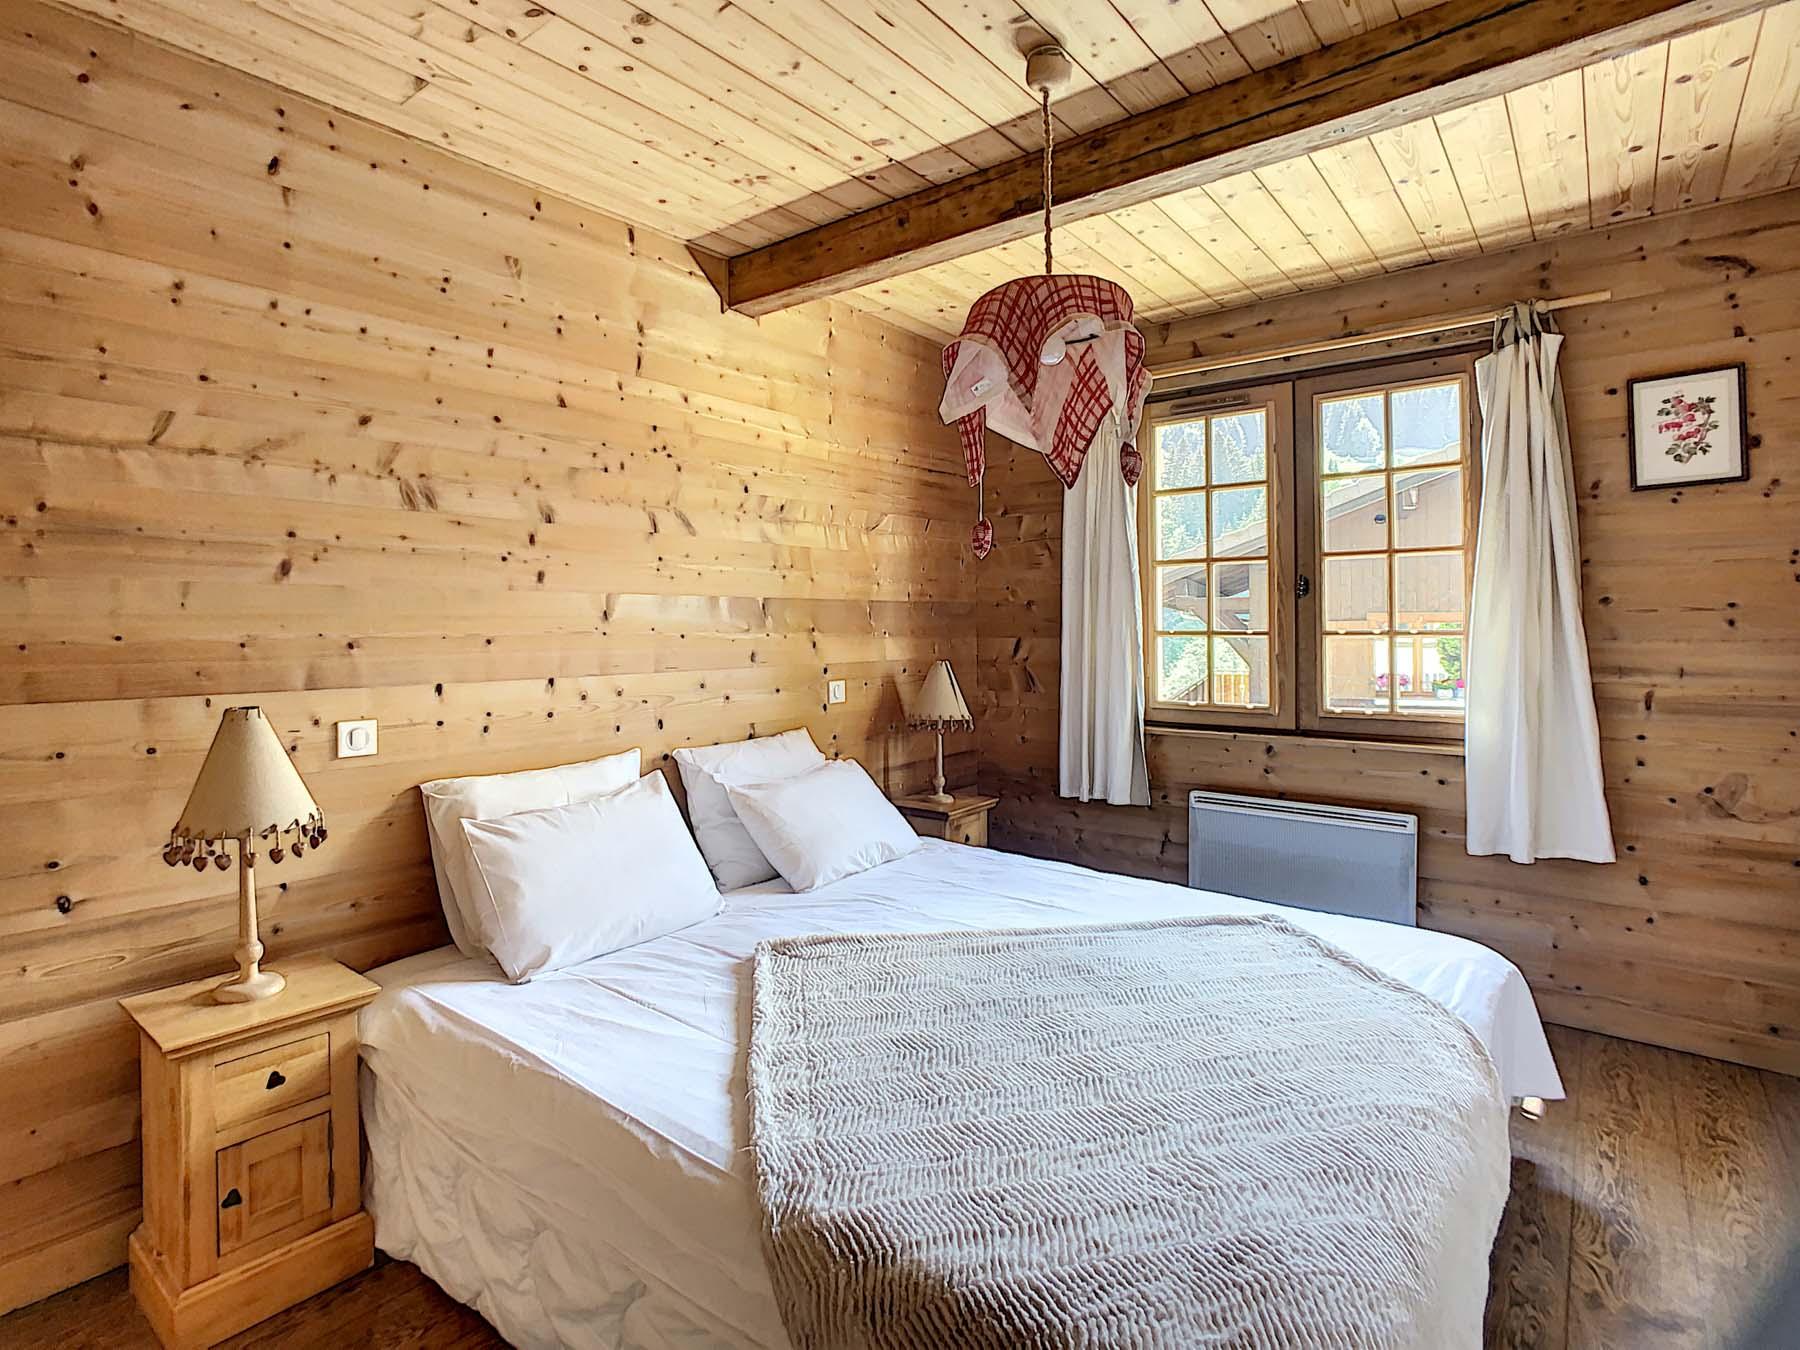 Mernaz 1160 Master Bedroom